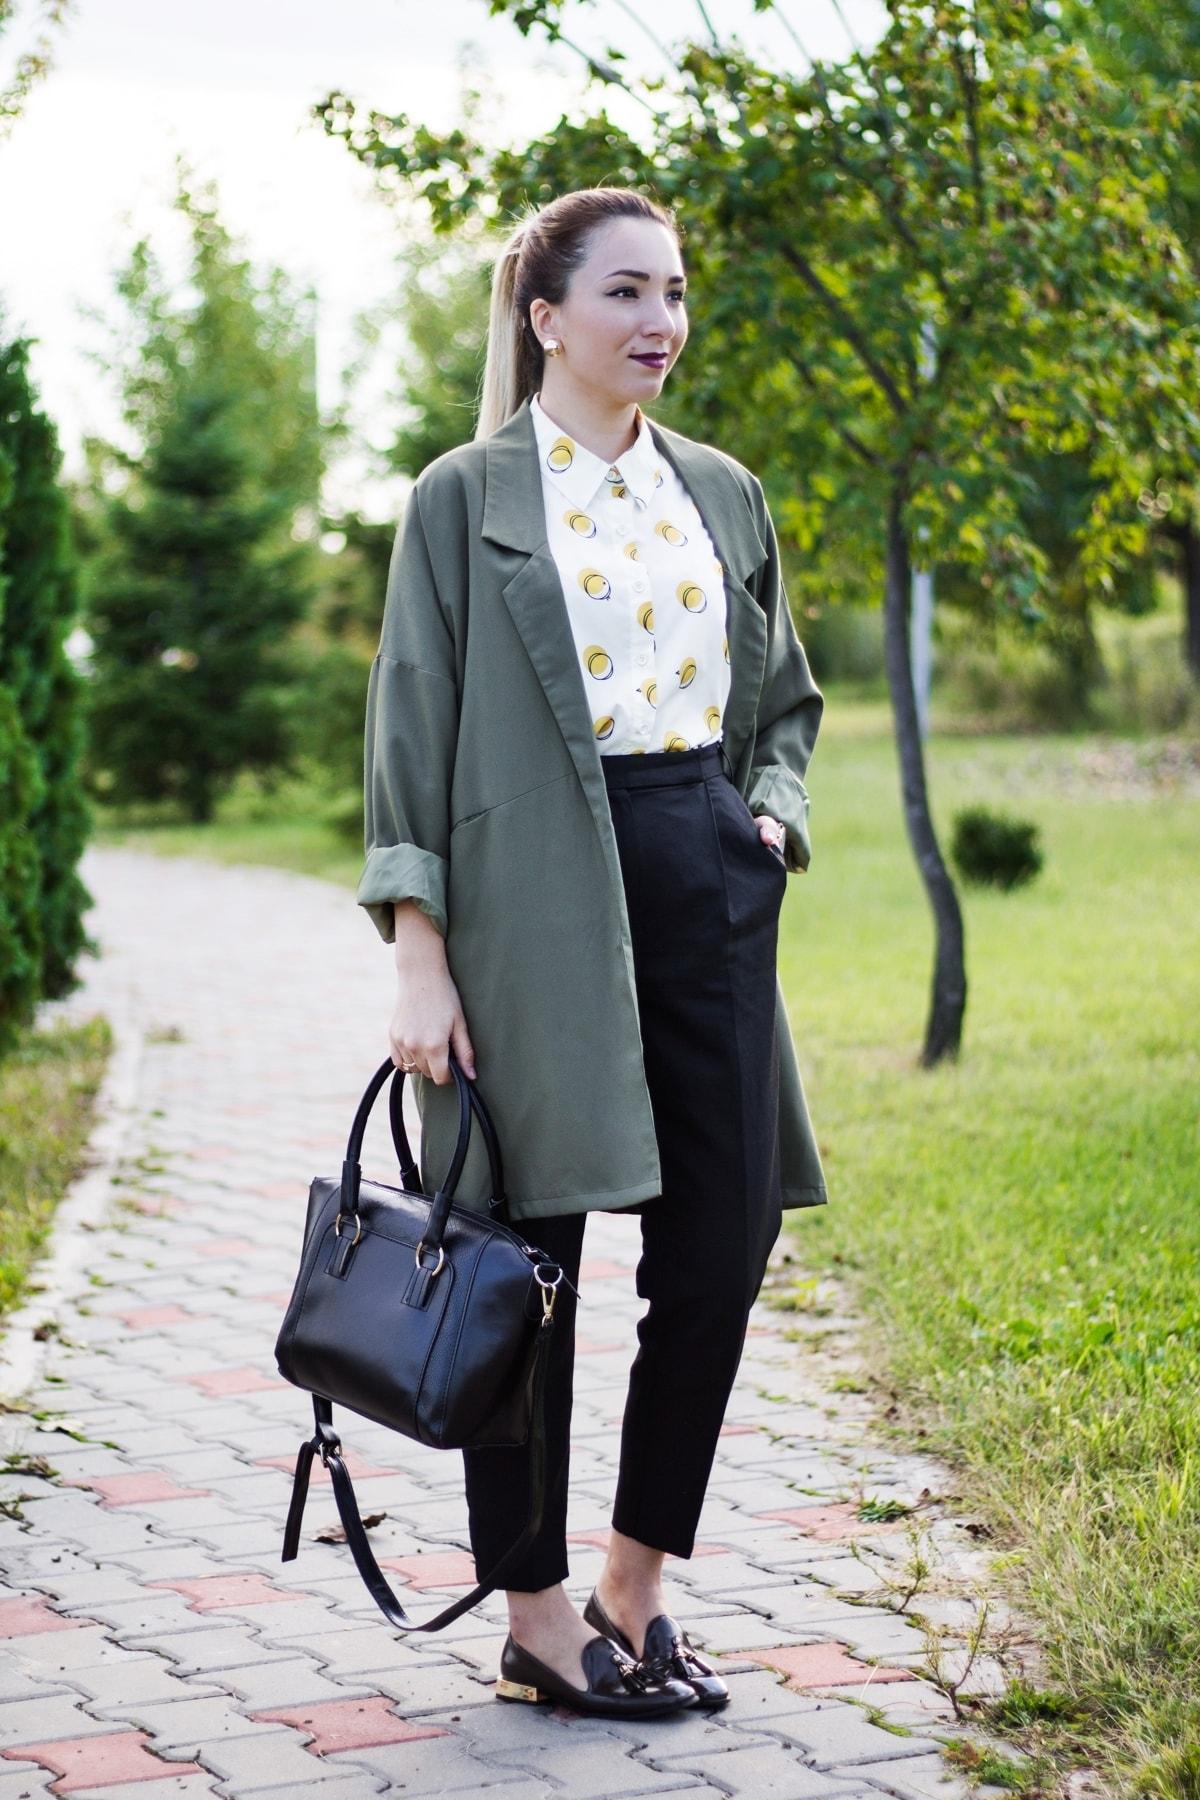 cum sa porti o jacheta verde militar toamna, idei tinute